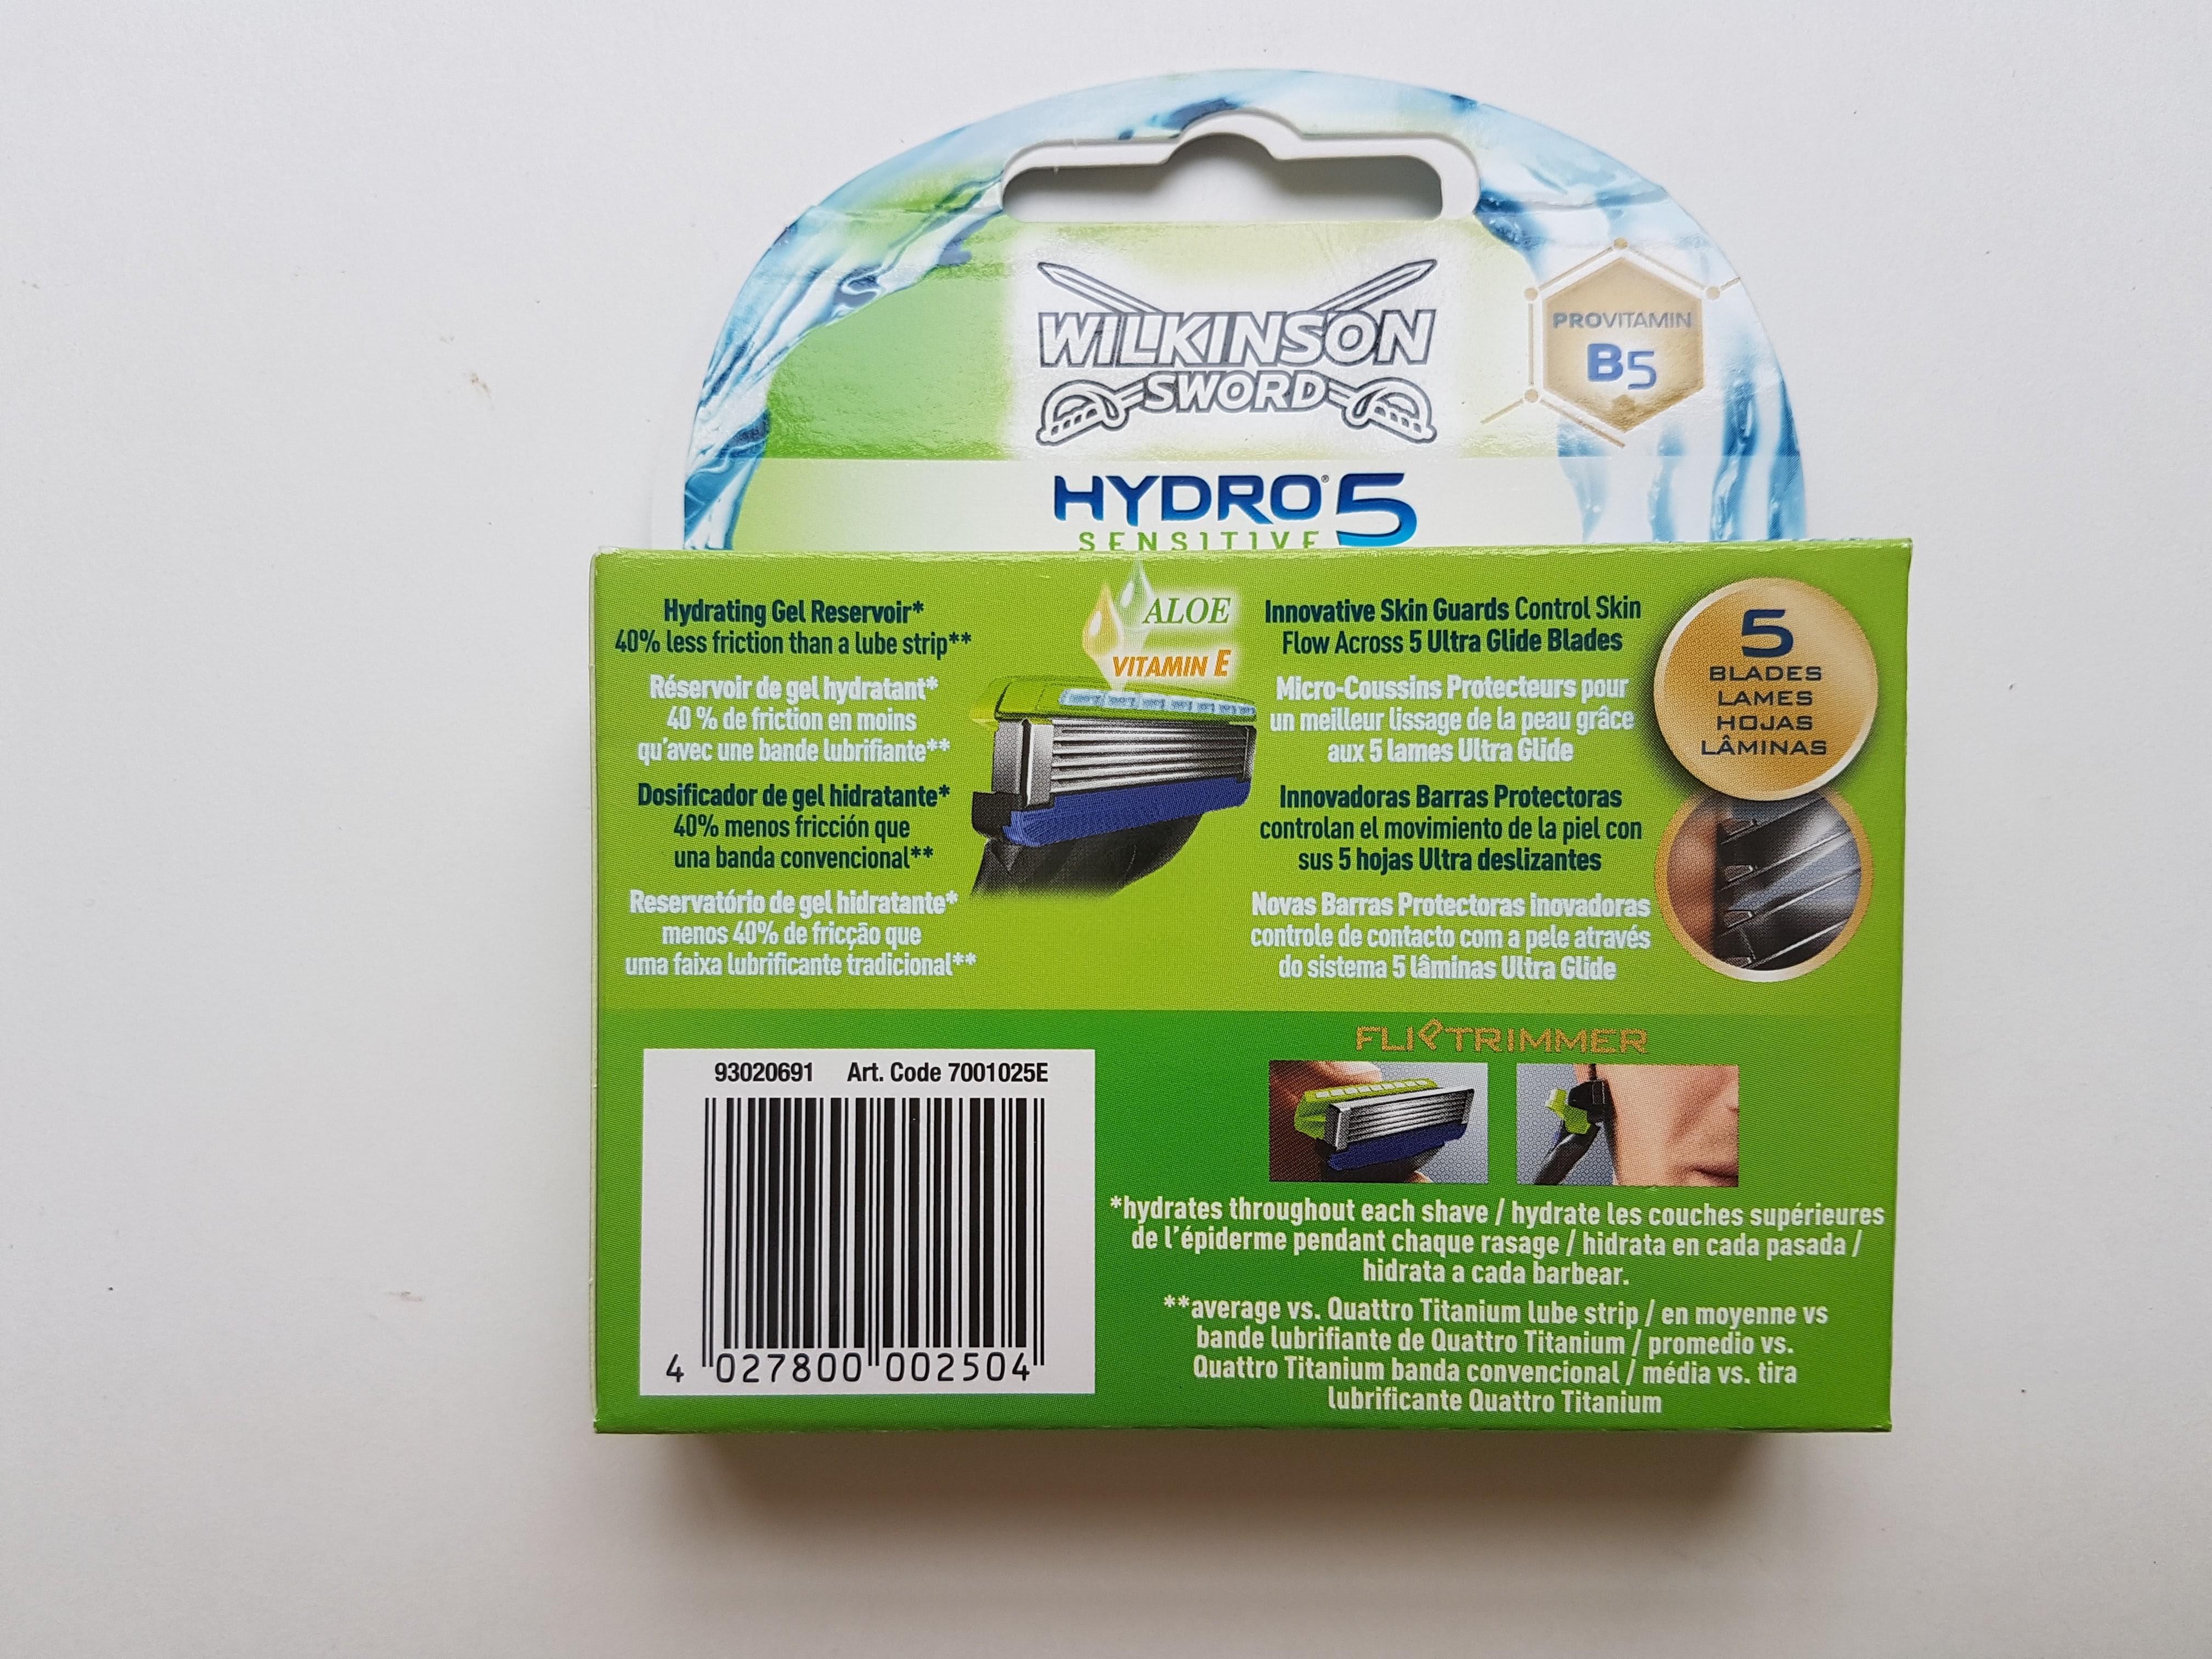 Wilkinson-Sword-Hydro-5 - Wilkinson-Sword-Hydro-5-8.jpg